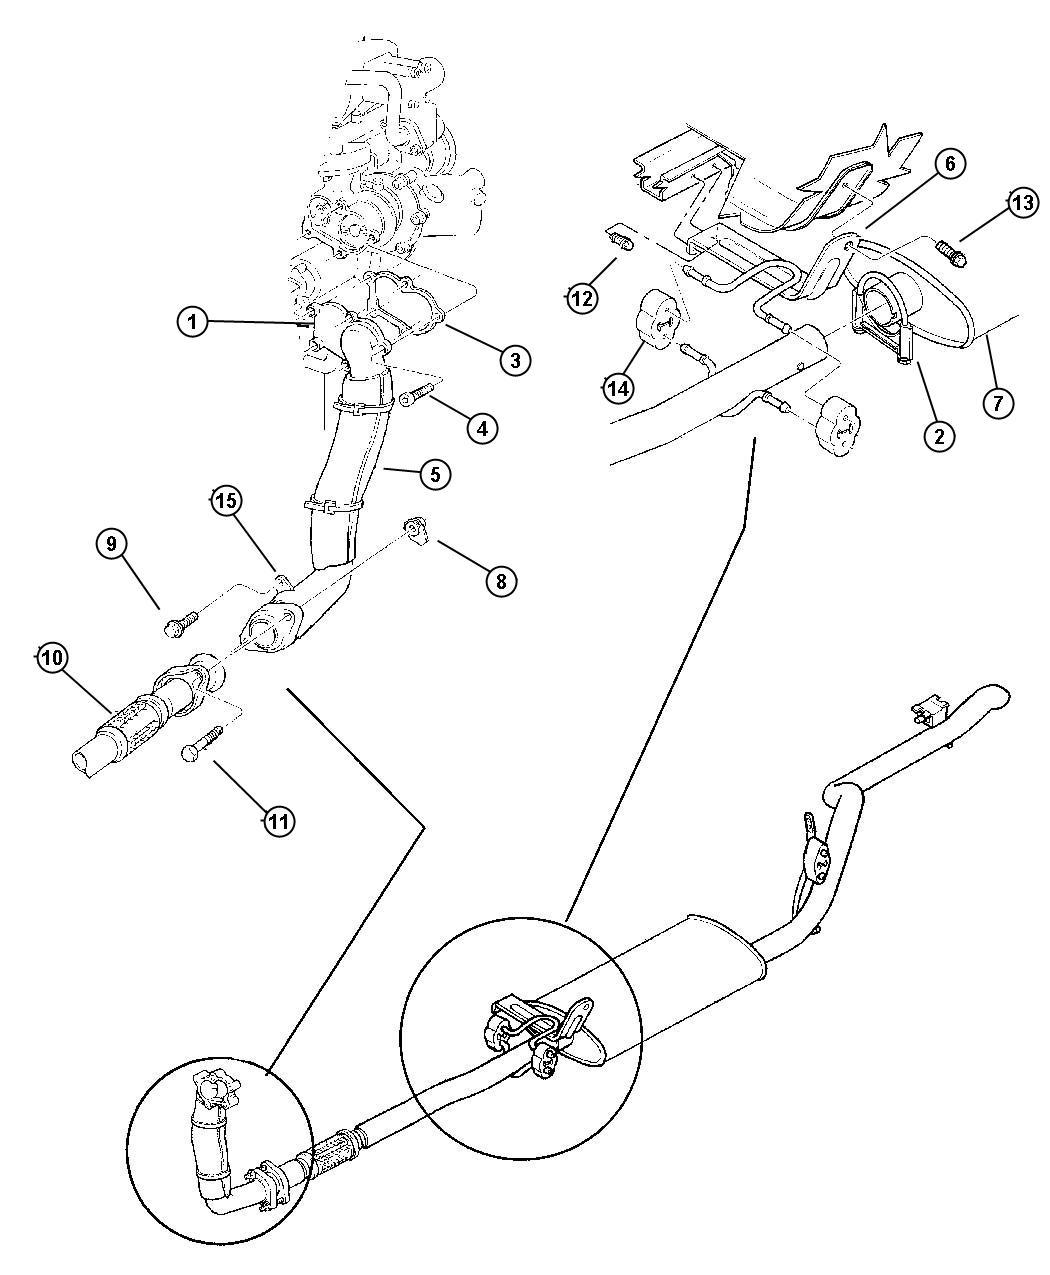 Jeep Cherokee Flange. Exhaust pipe. Hanger, down pipe ...